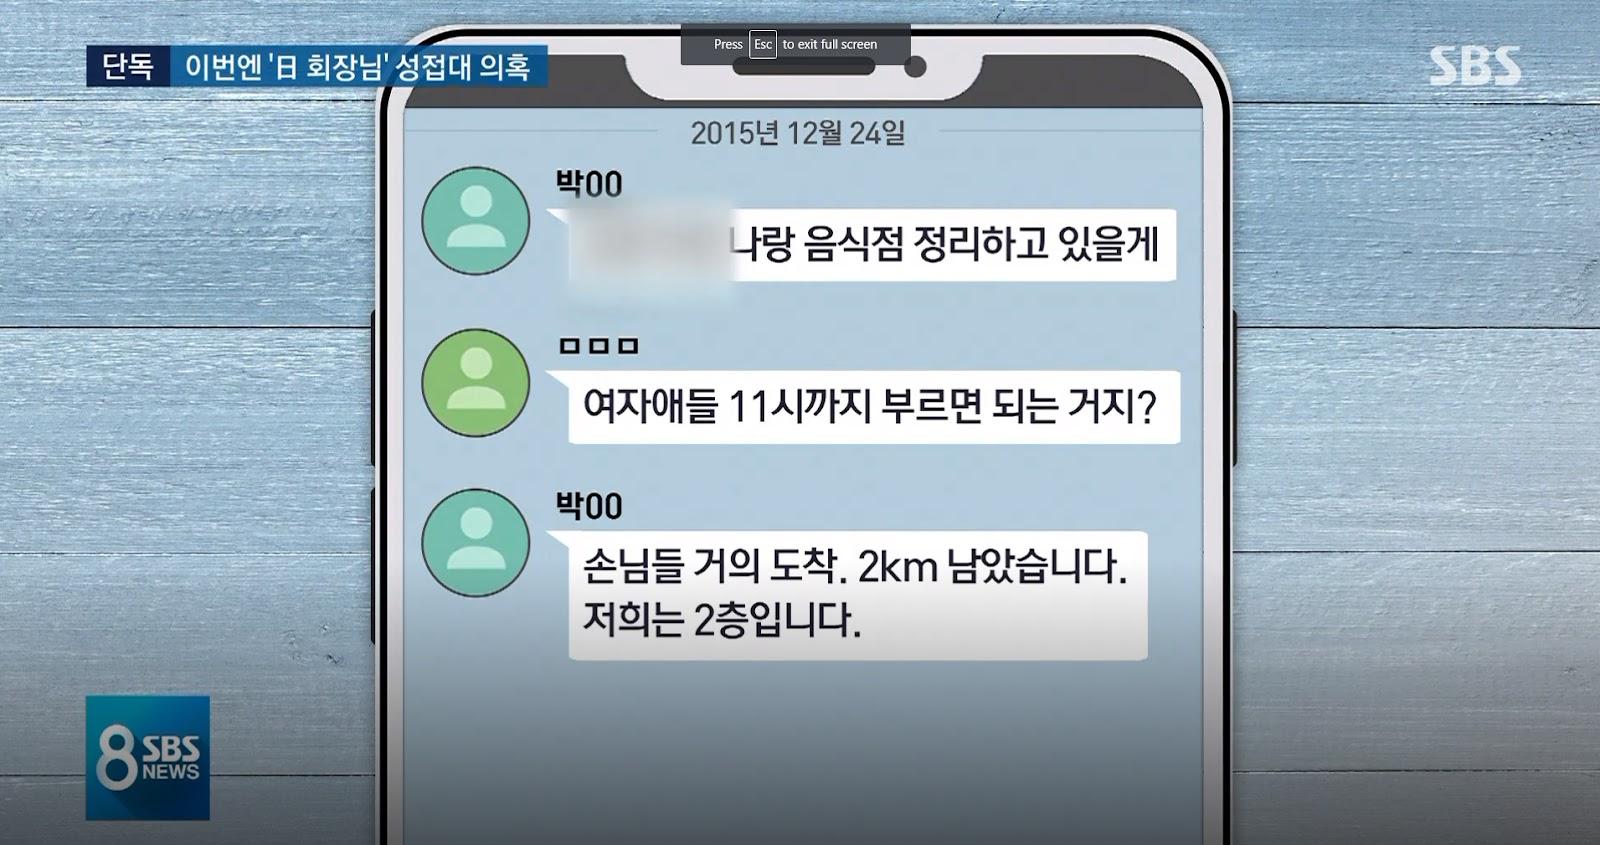 seungri ss 3